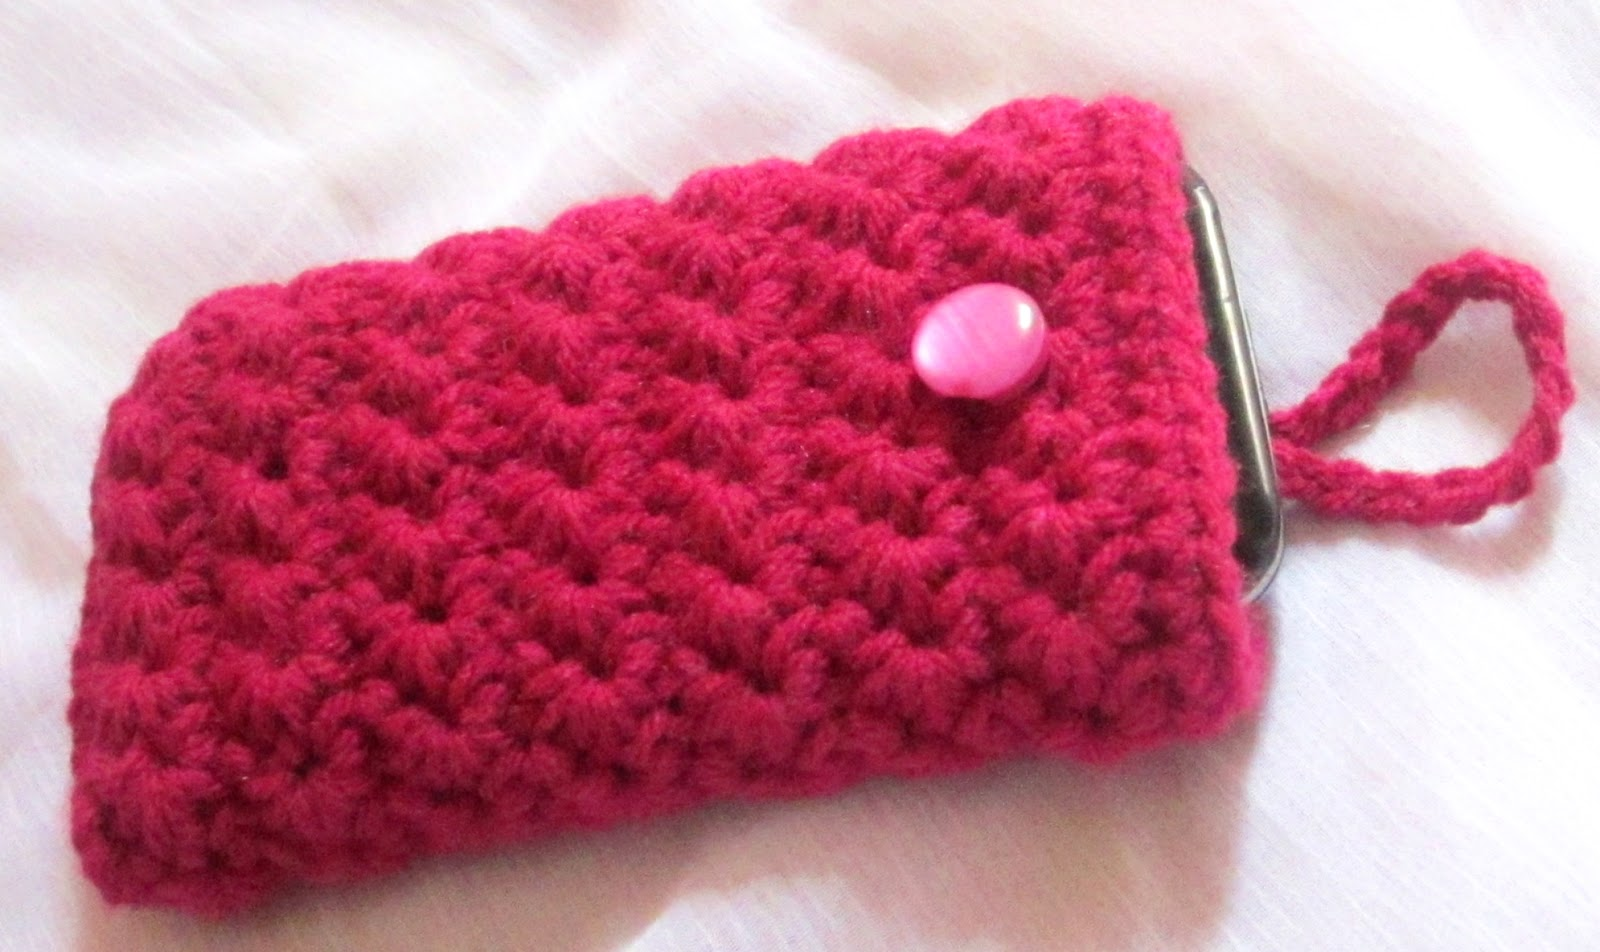 Crochet Cell Phone Case A Little Love Everyday